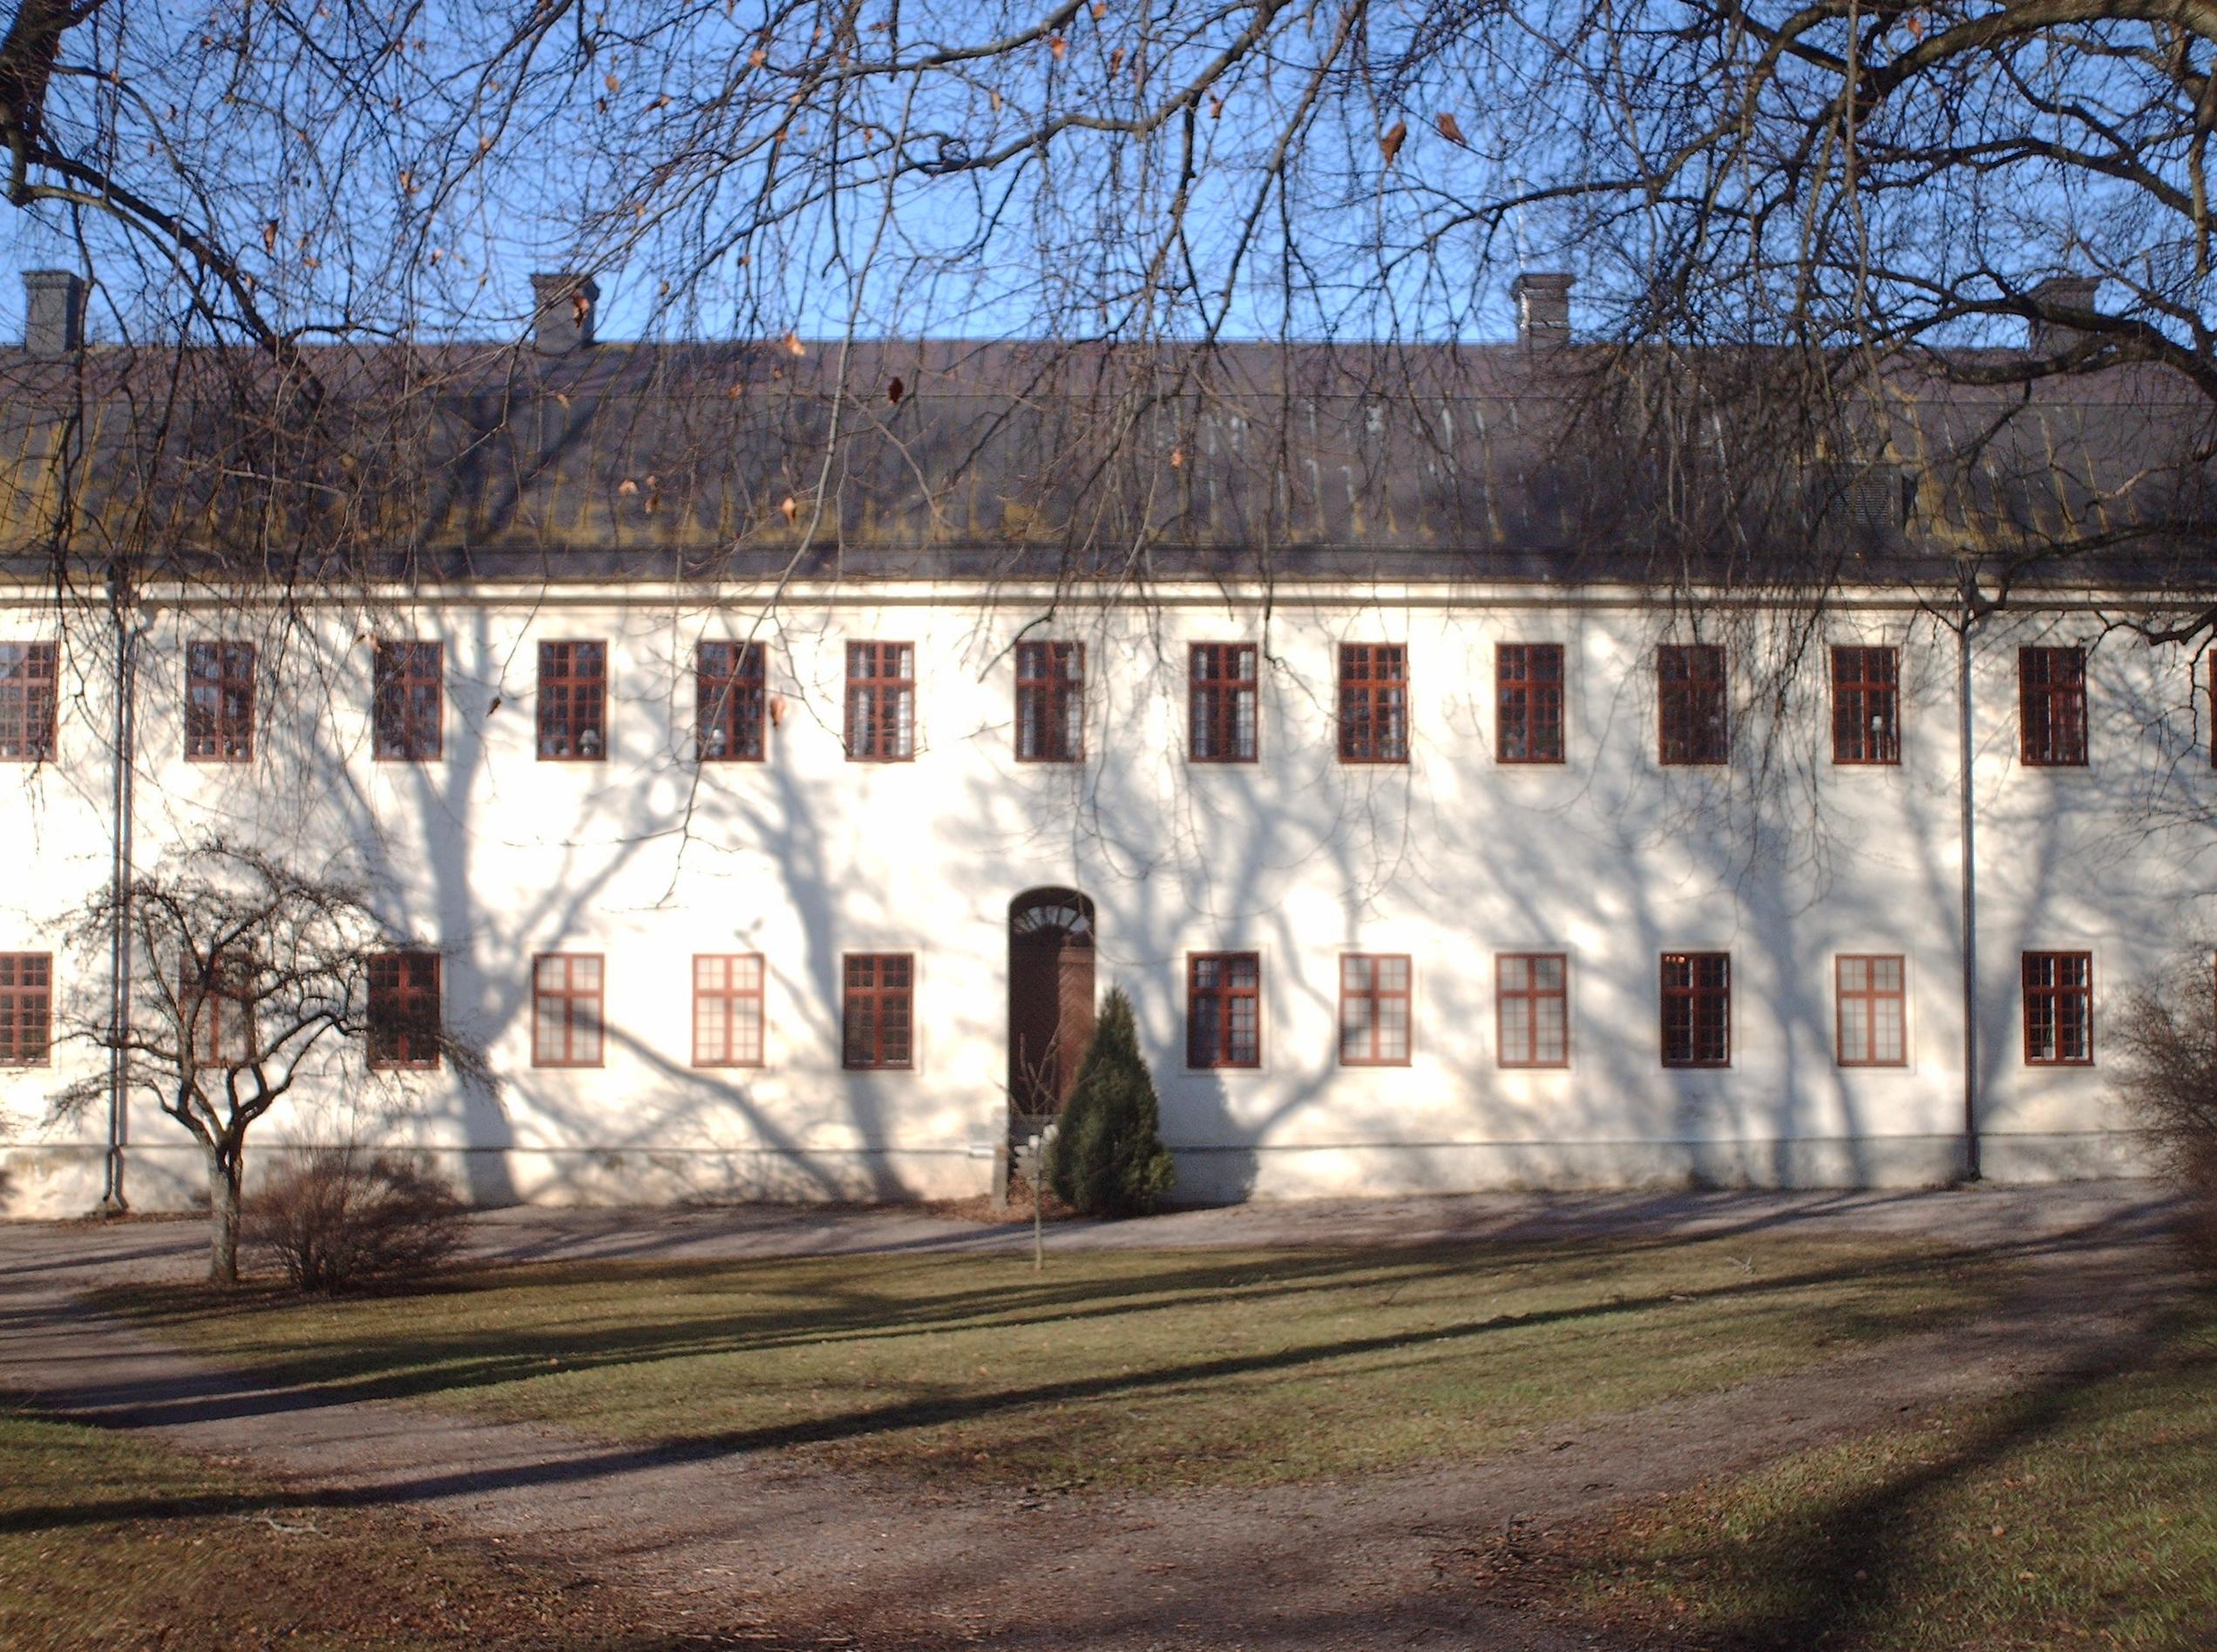 torggatan 1 escorttjej östergötland